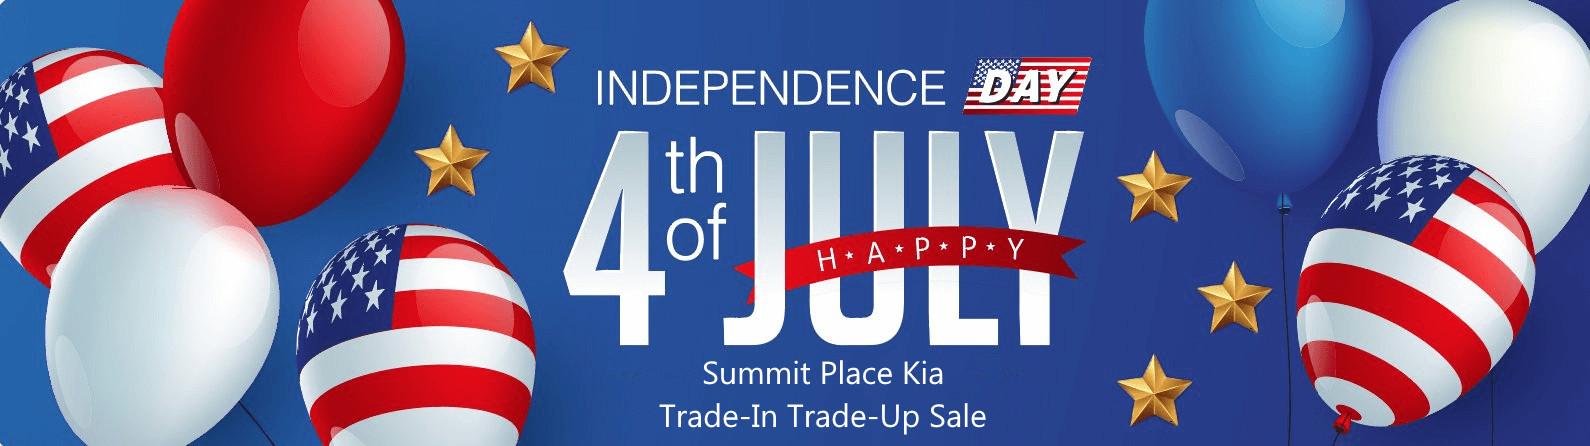 Kia 4th of July Car Sale